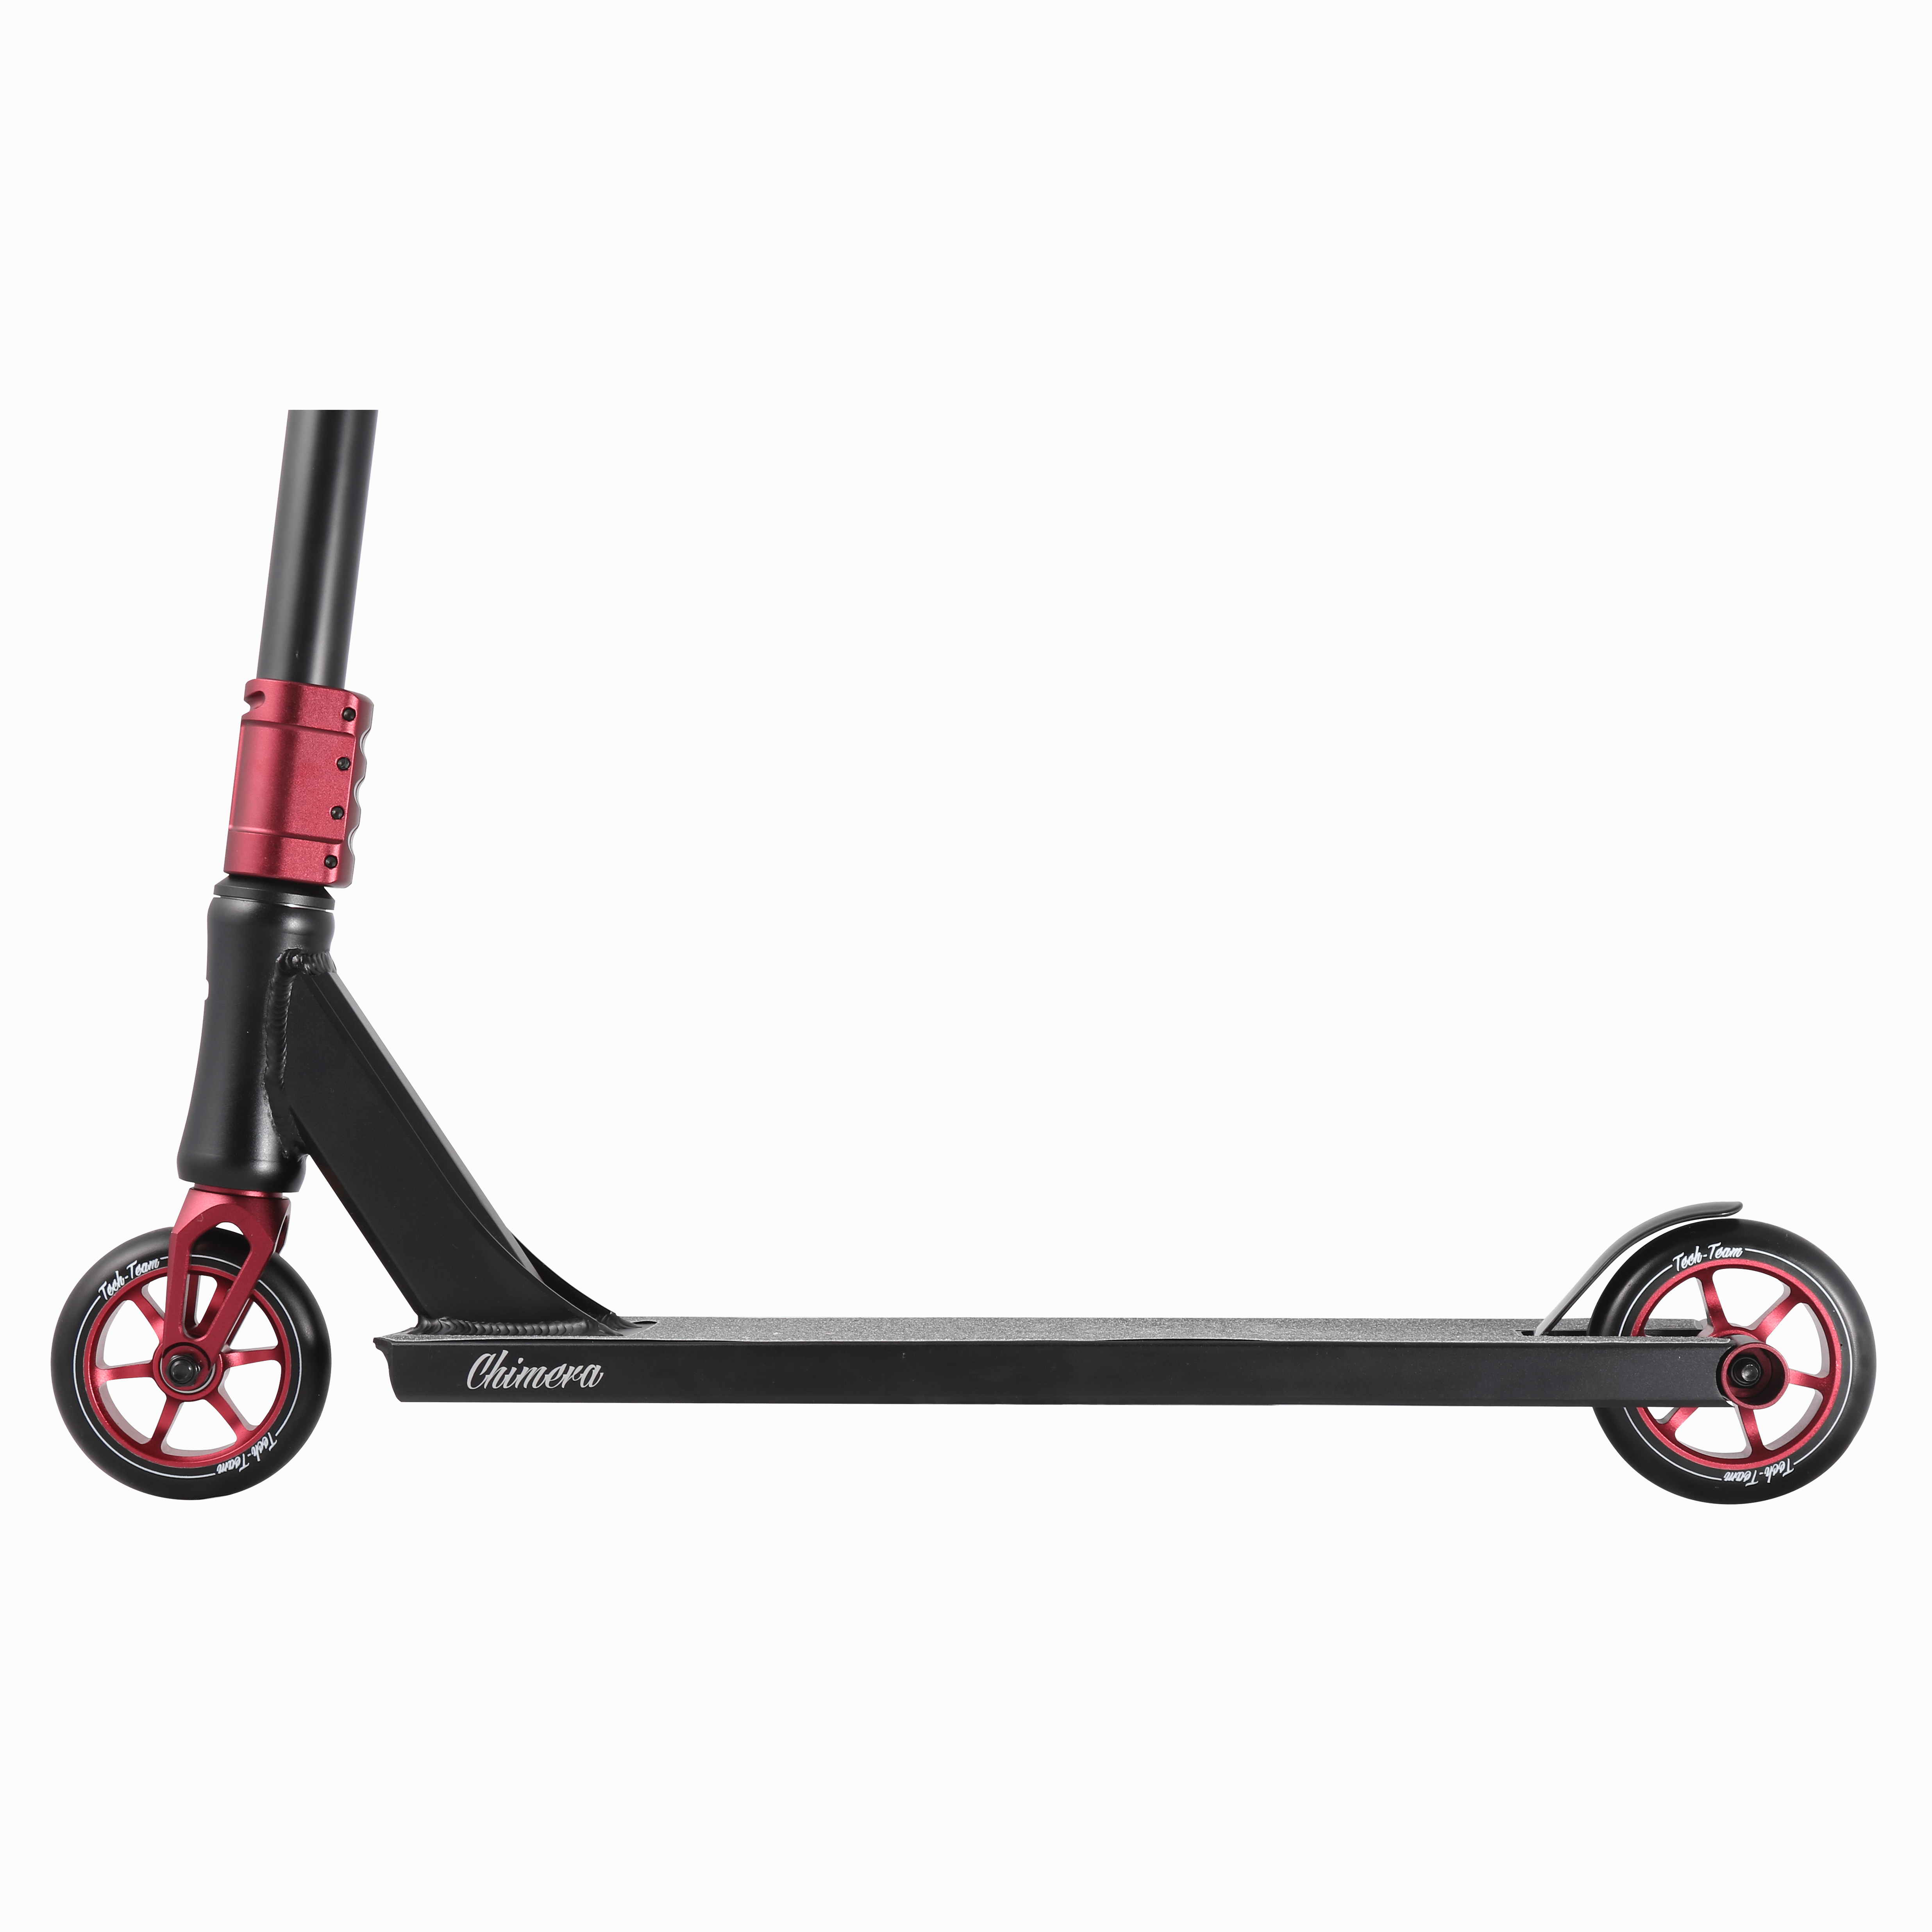 Самокат трюковый TT CHIMERA 2021